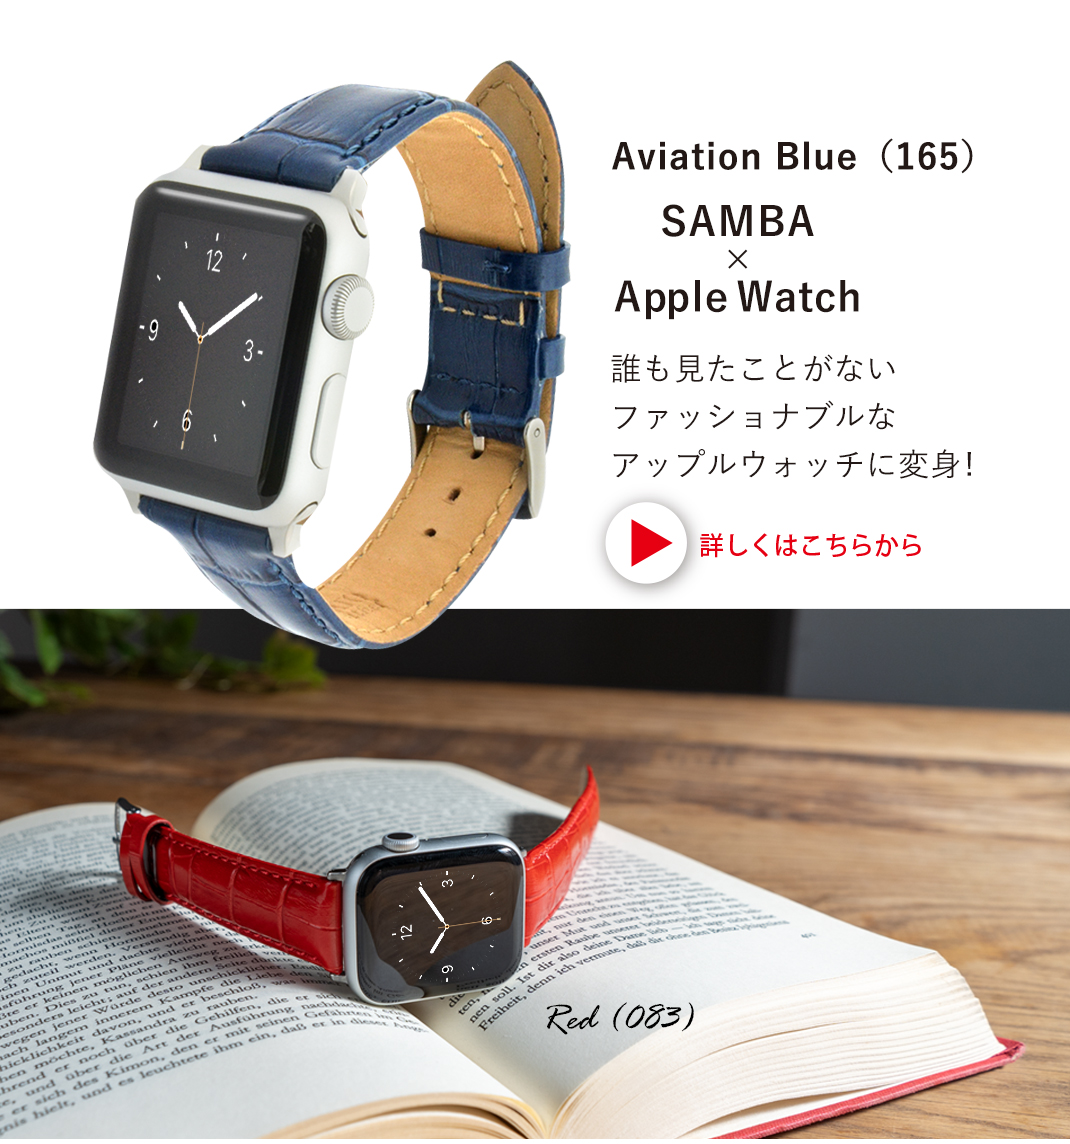 SAMBA (サンバ)装着イメージとカラー